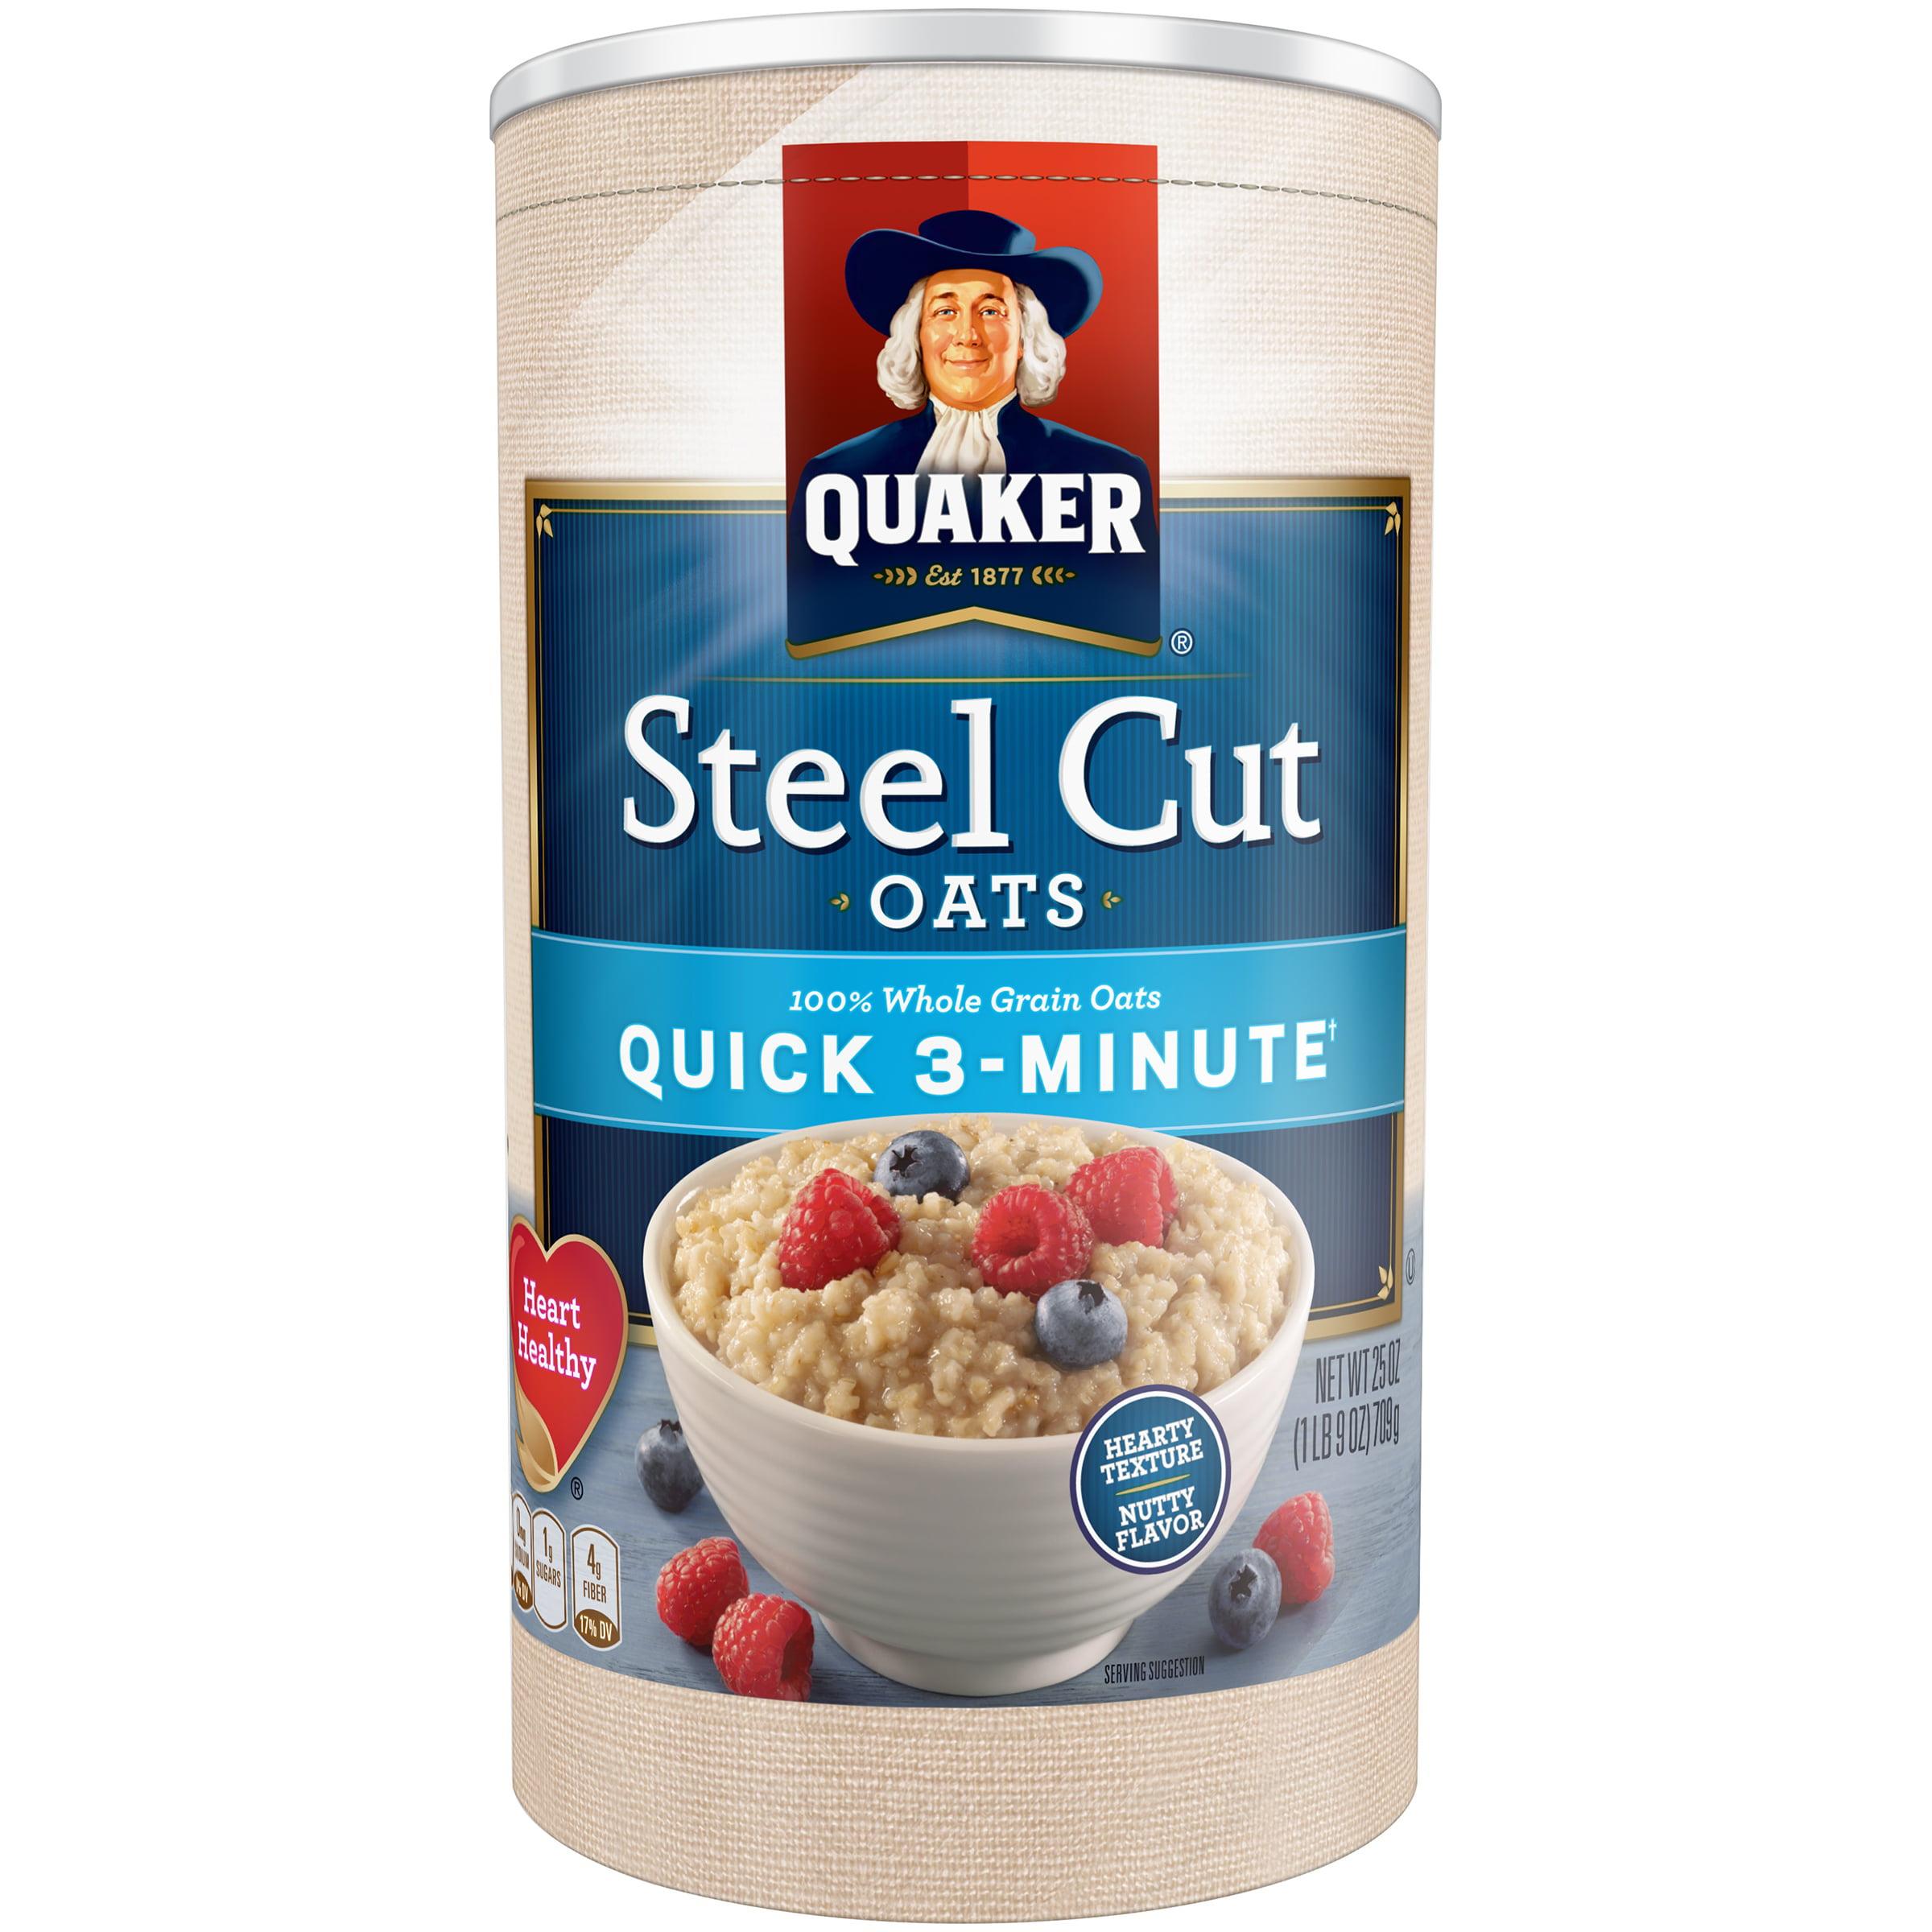 Quaker Steel Cut Quick 3-Minute Oats, 25 oz Canister